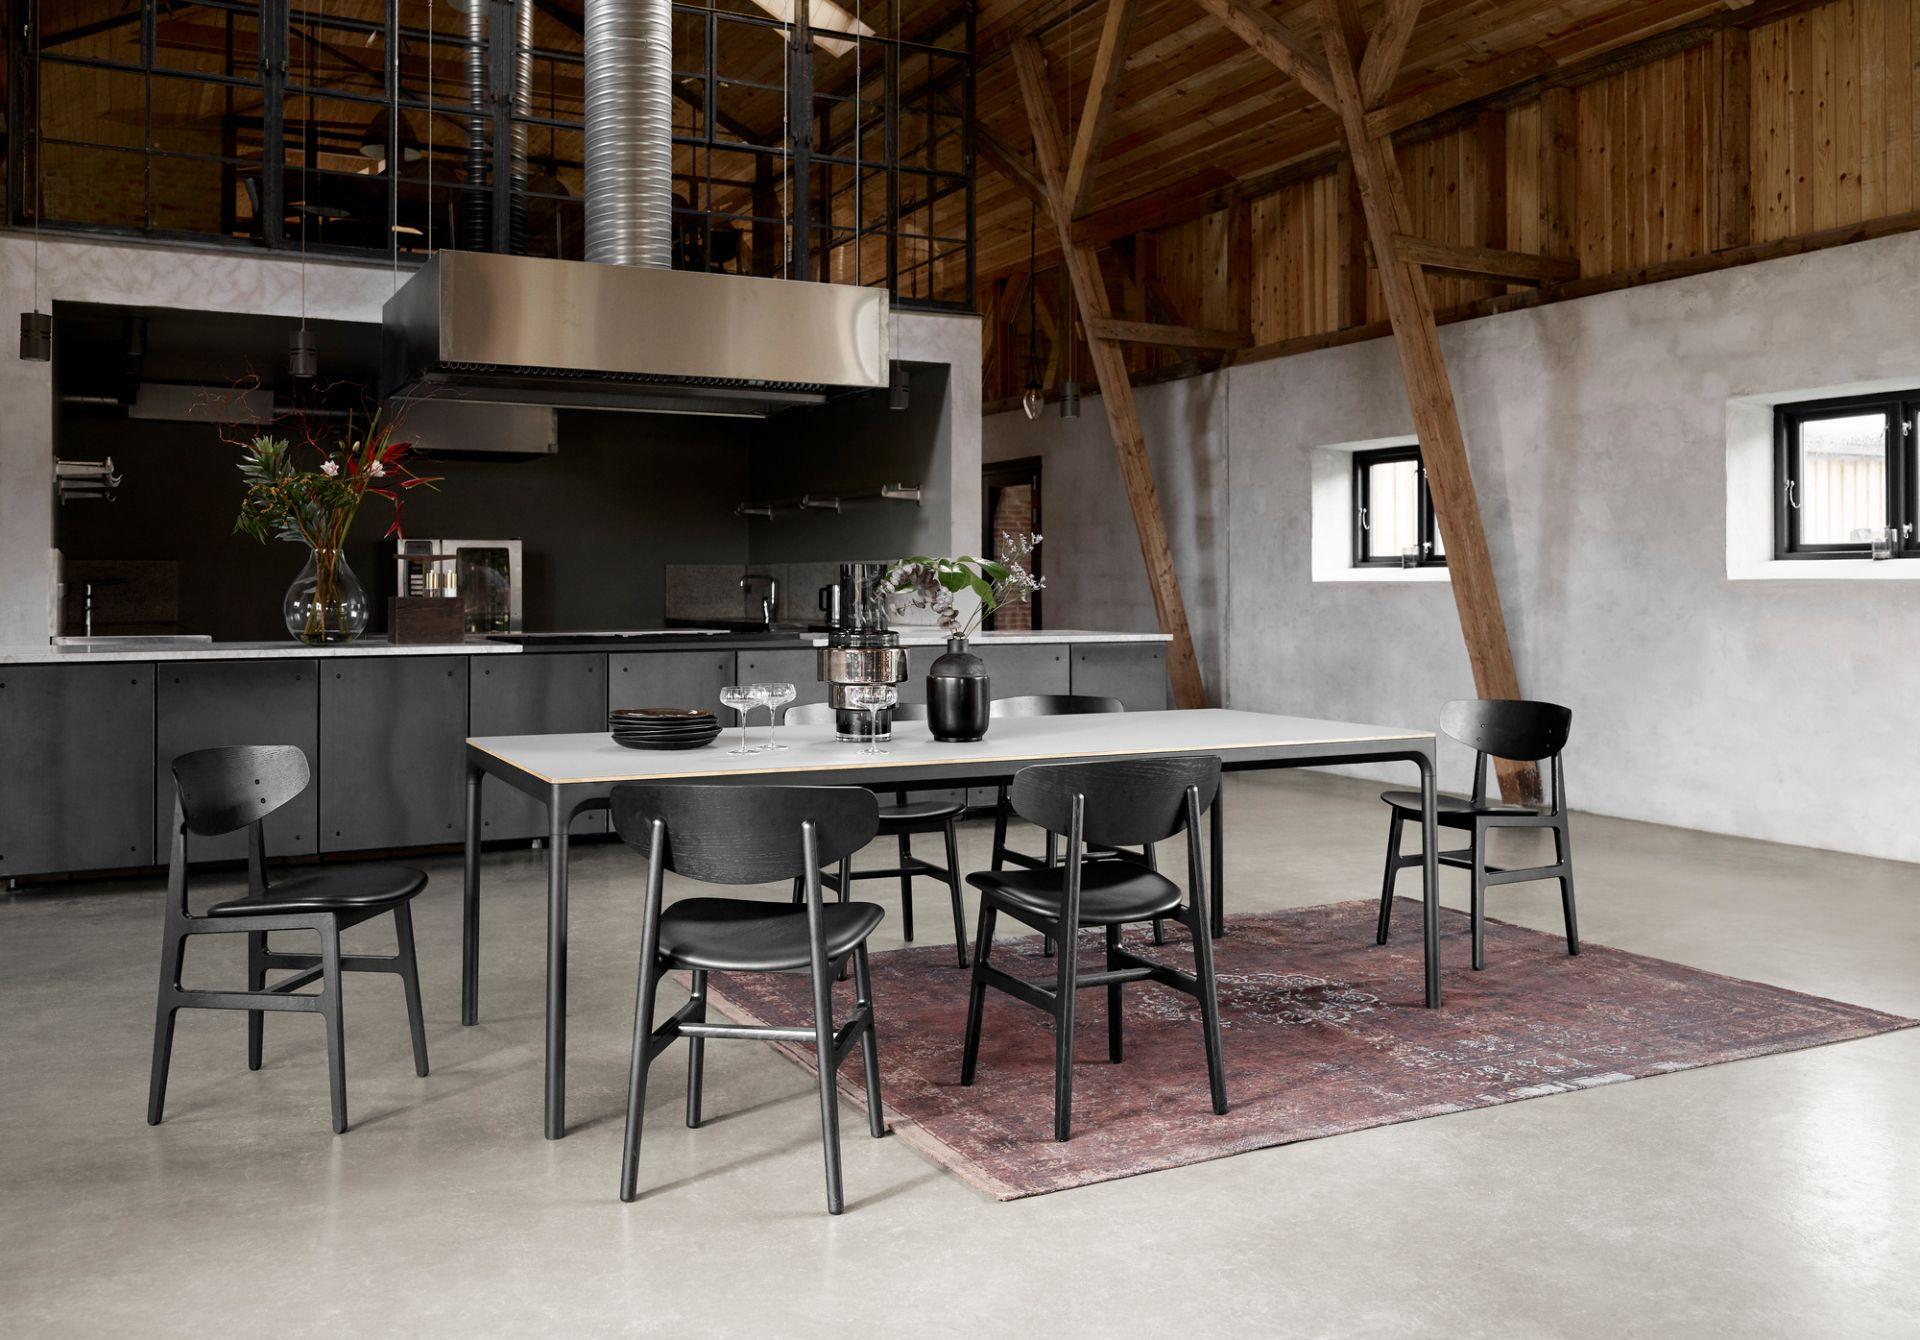 Four Dining Table Esstisch Houe B 160 X T 90 Cm Linoleum Aschgrau B 160 X T 90 X H 73 Cm Linoleum Aschgrau Houe 12406 63 6673